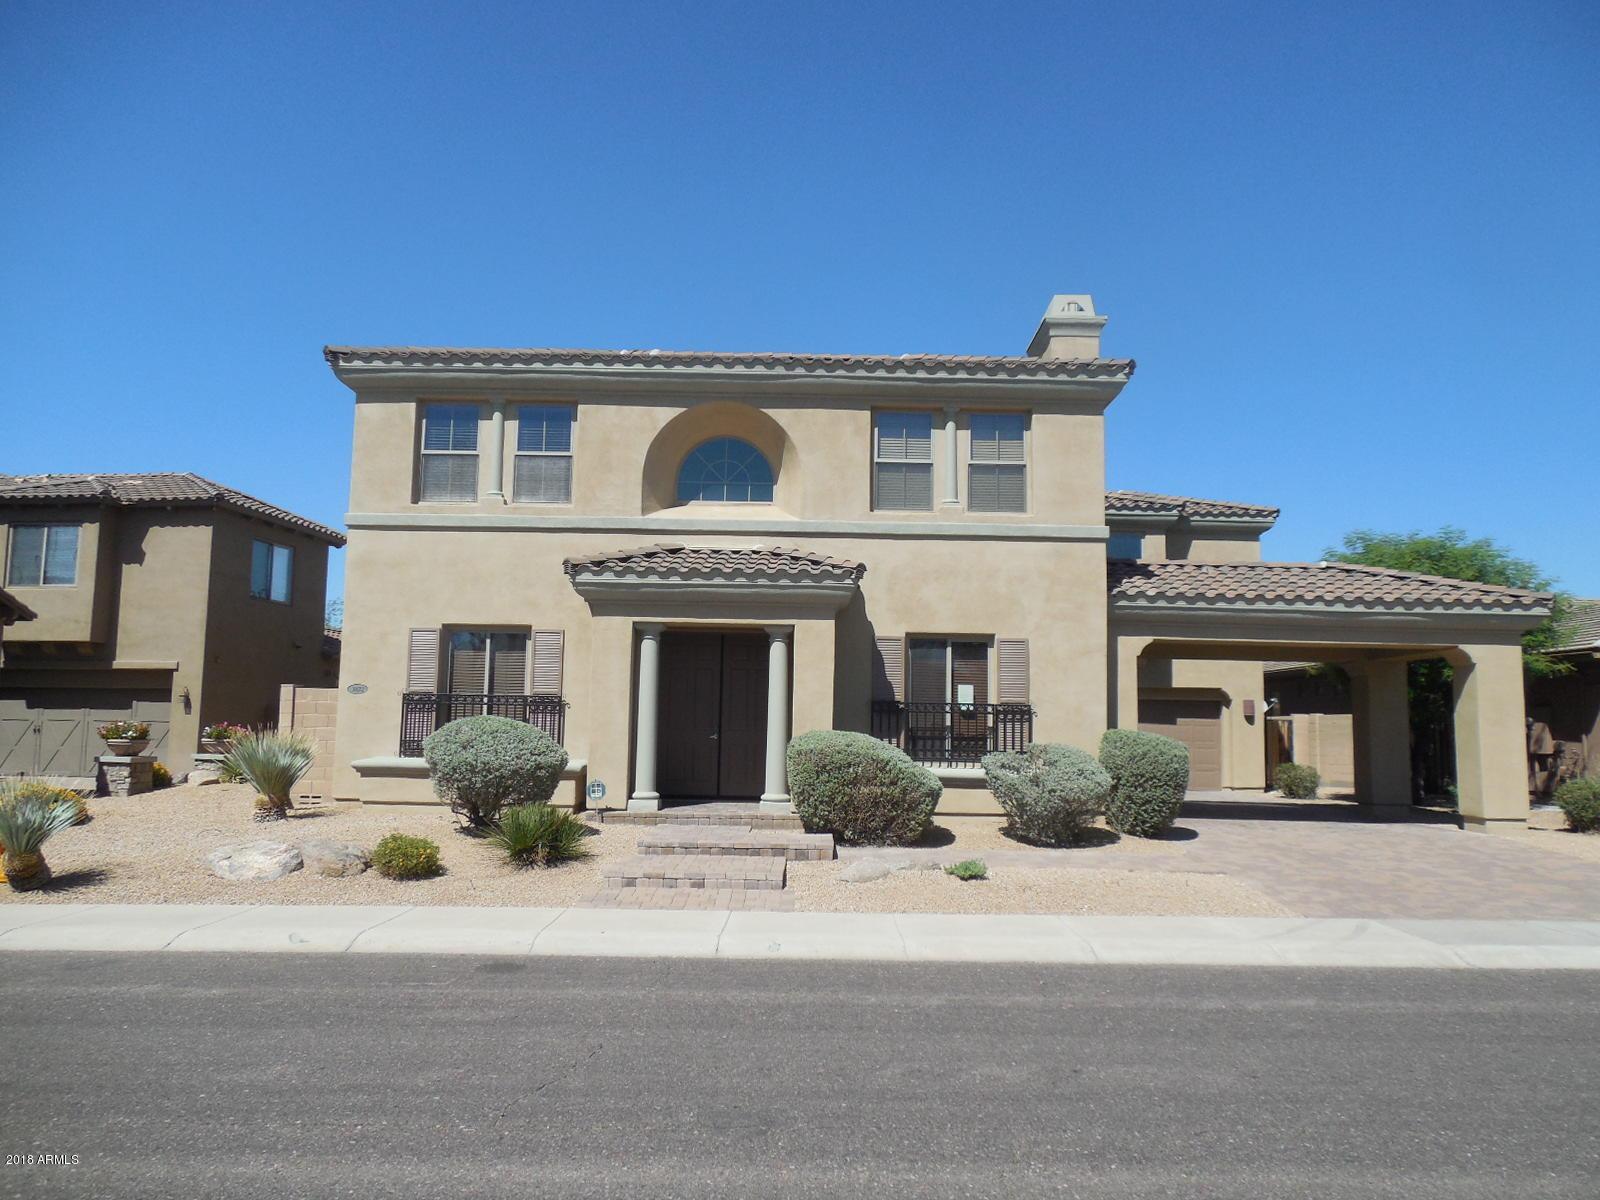 Photo for 3822 E Cielo Grande Avenue, Phoenix, AZ 85050 (MLS # 5814511)